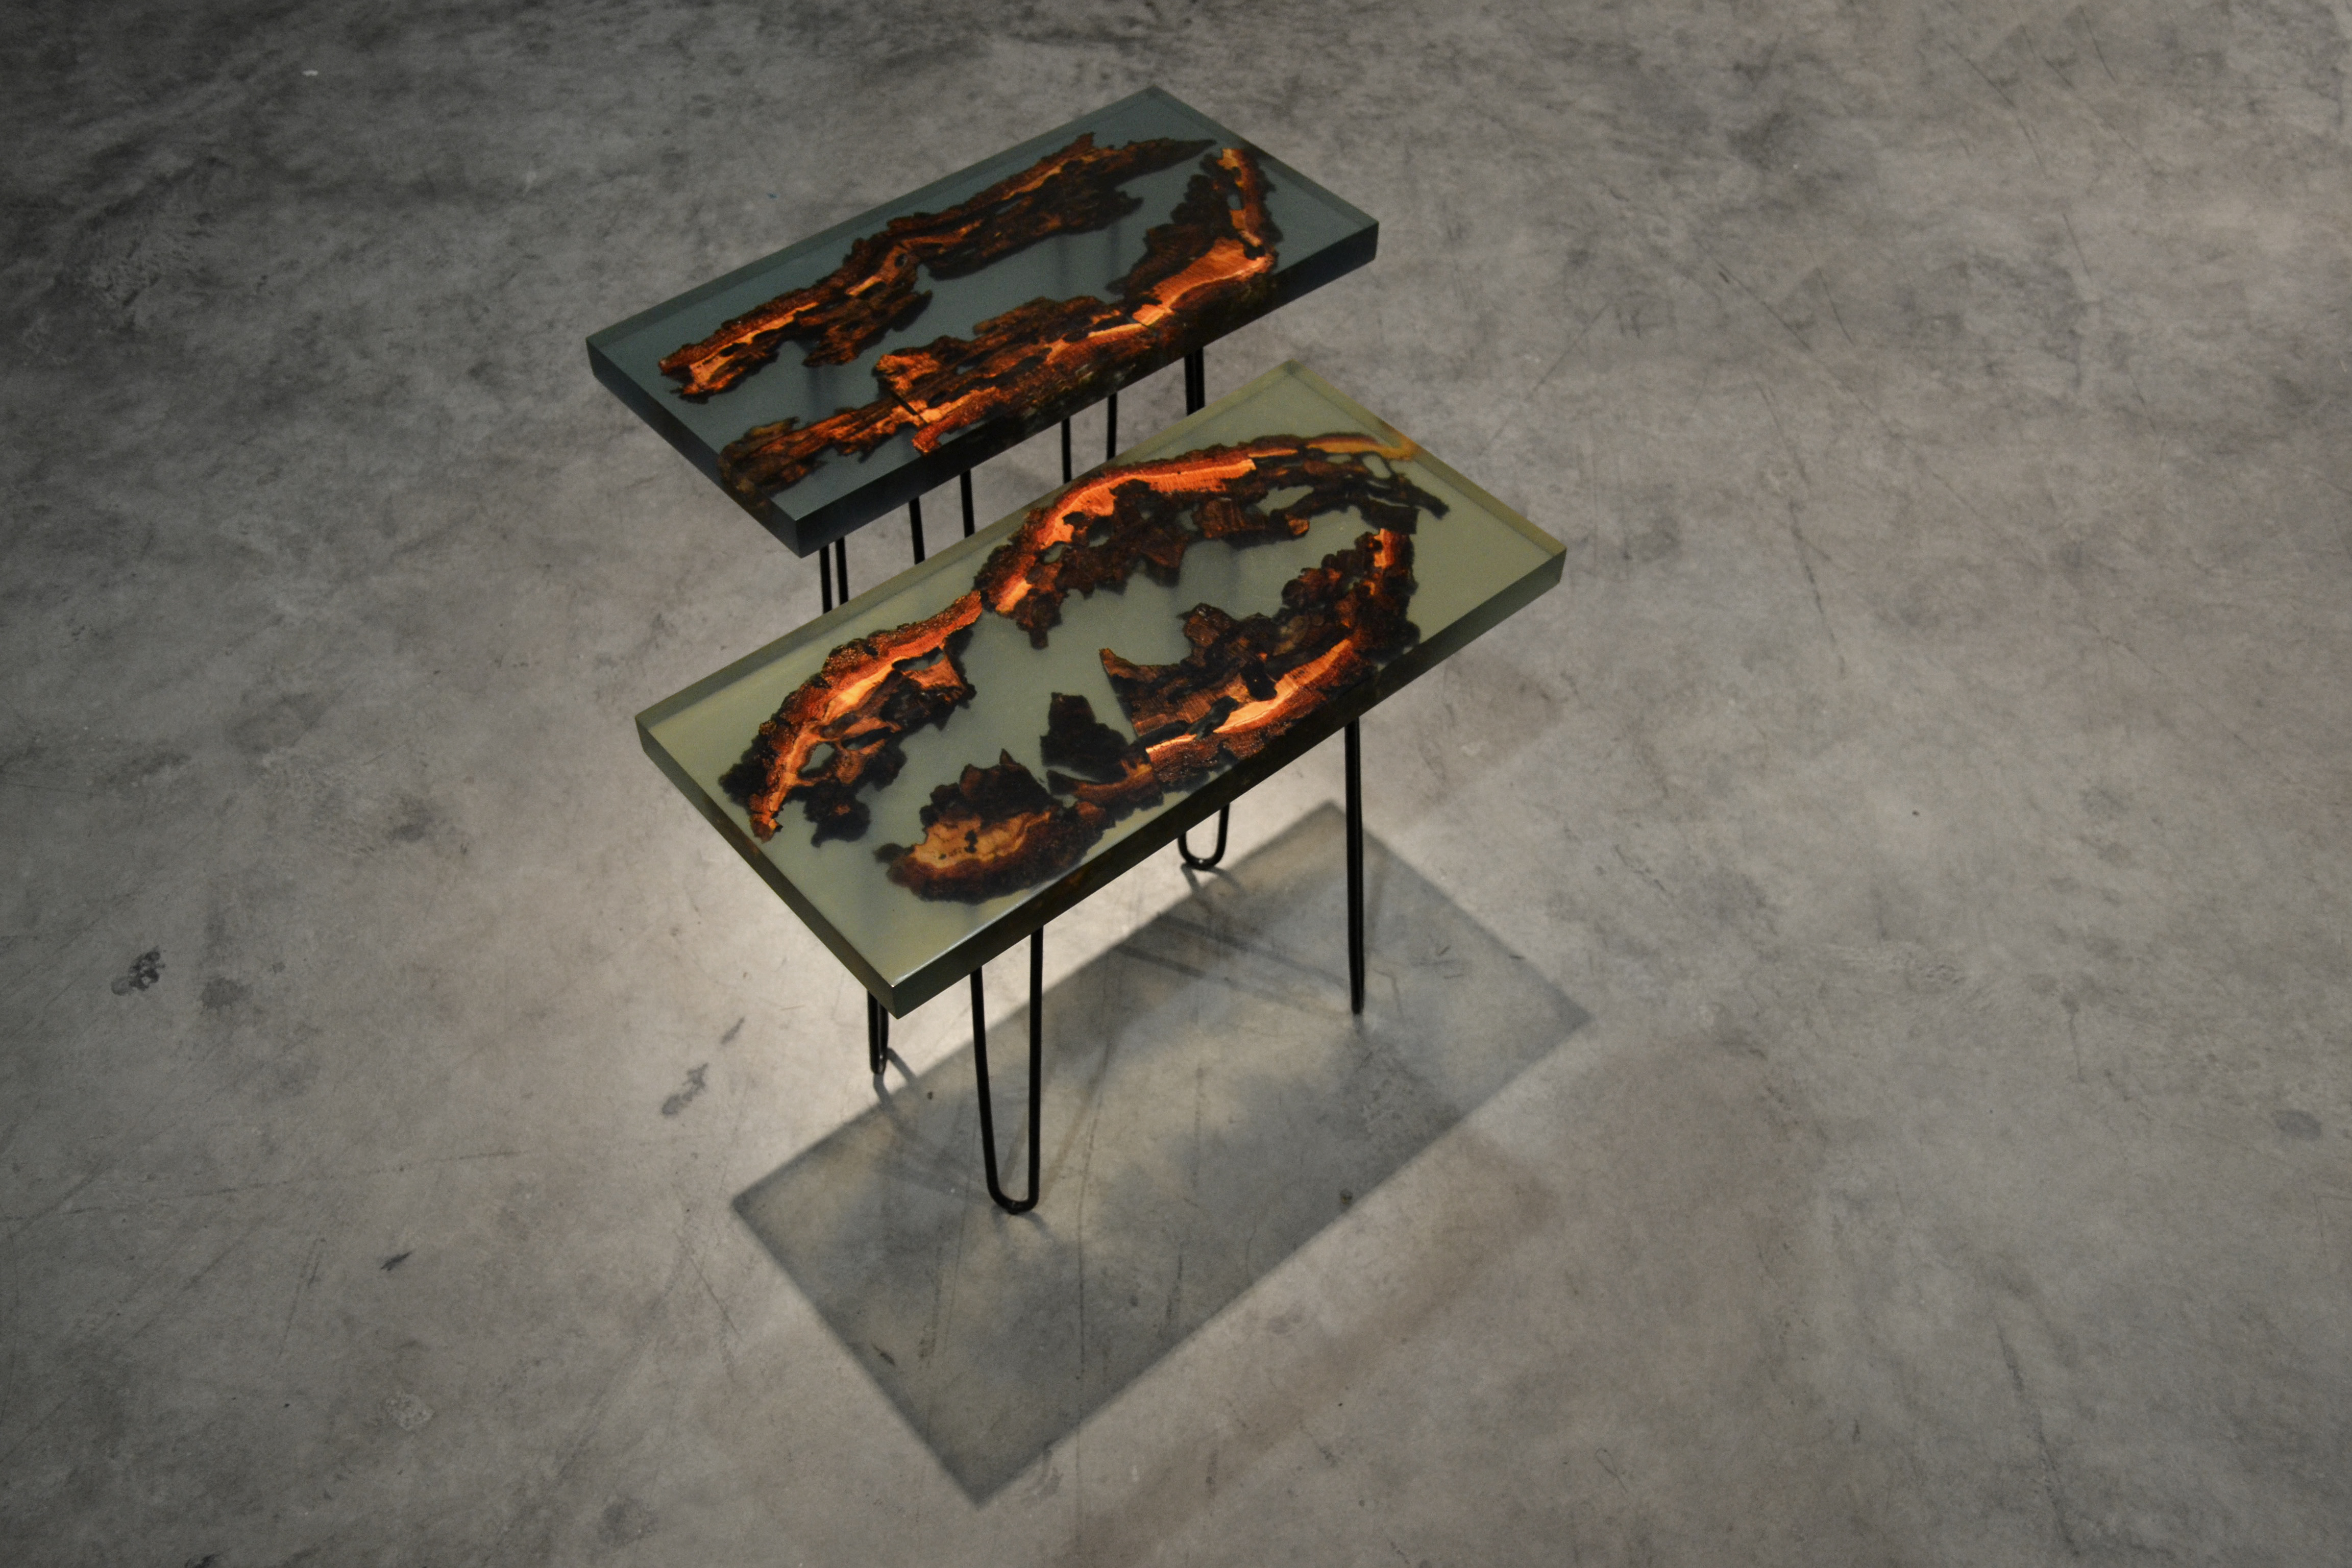 Aperçu_Designs_Pompeii_DDD2017